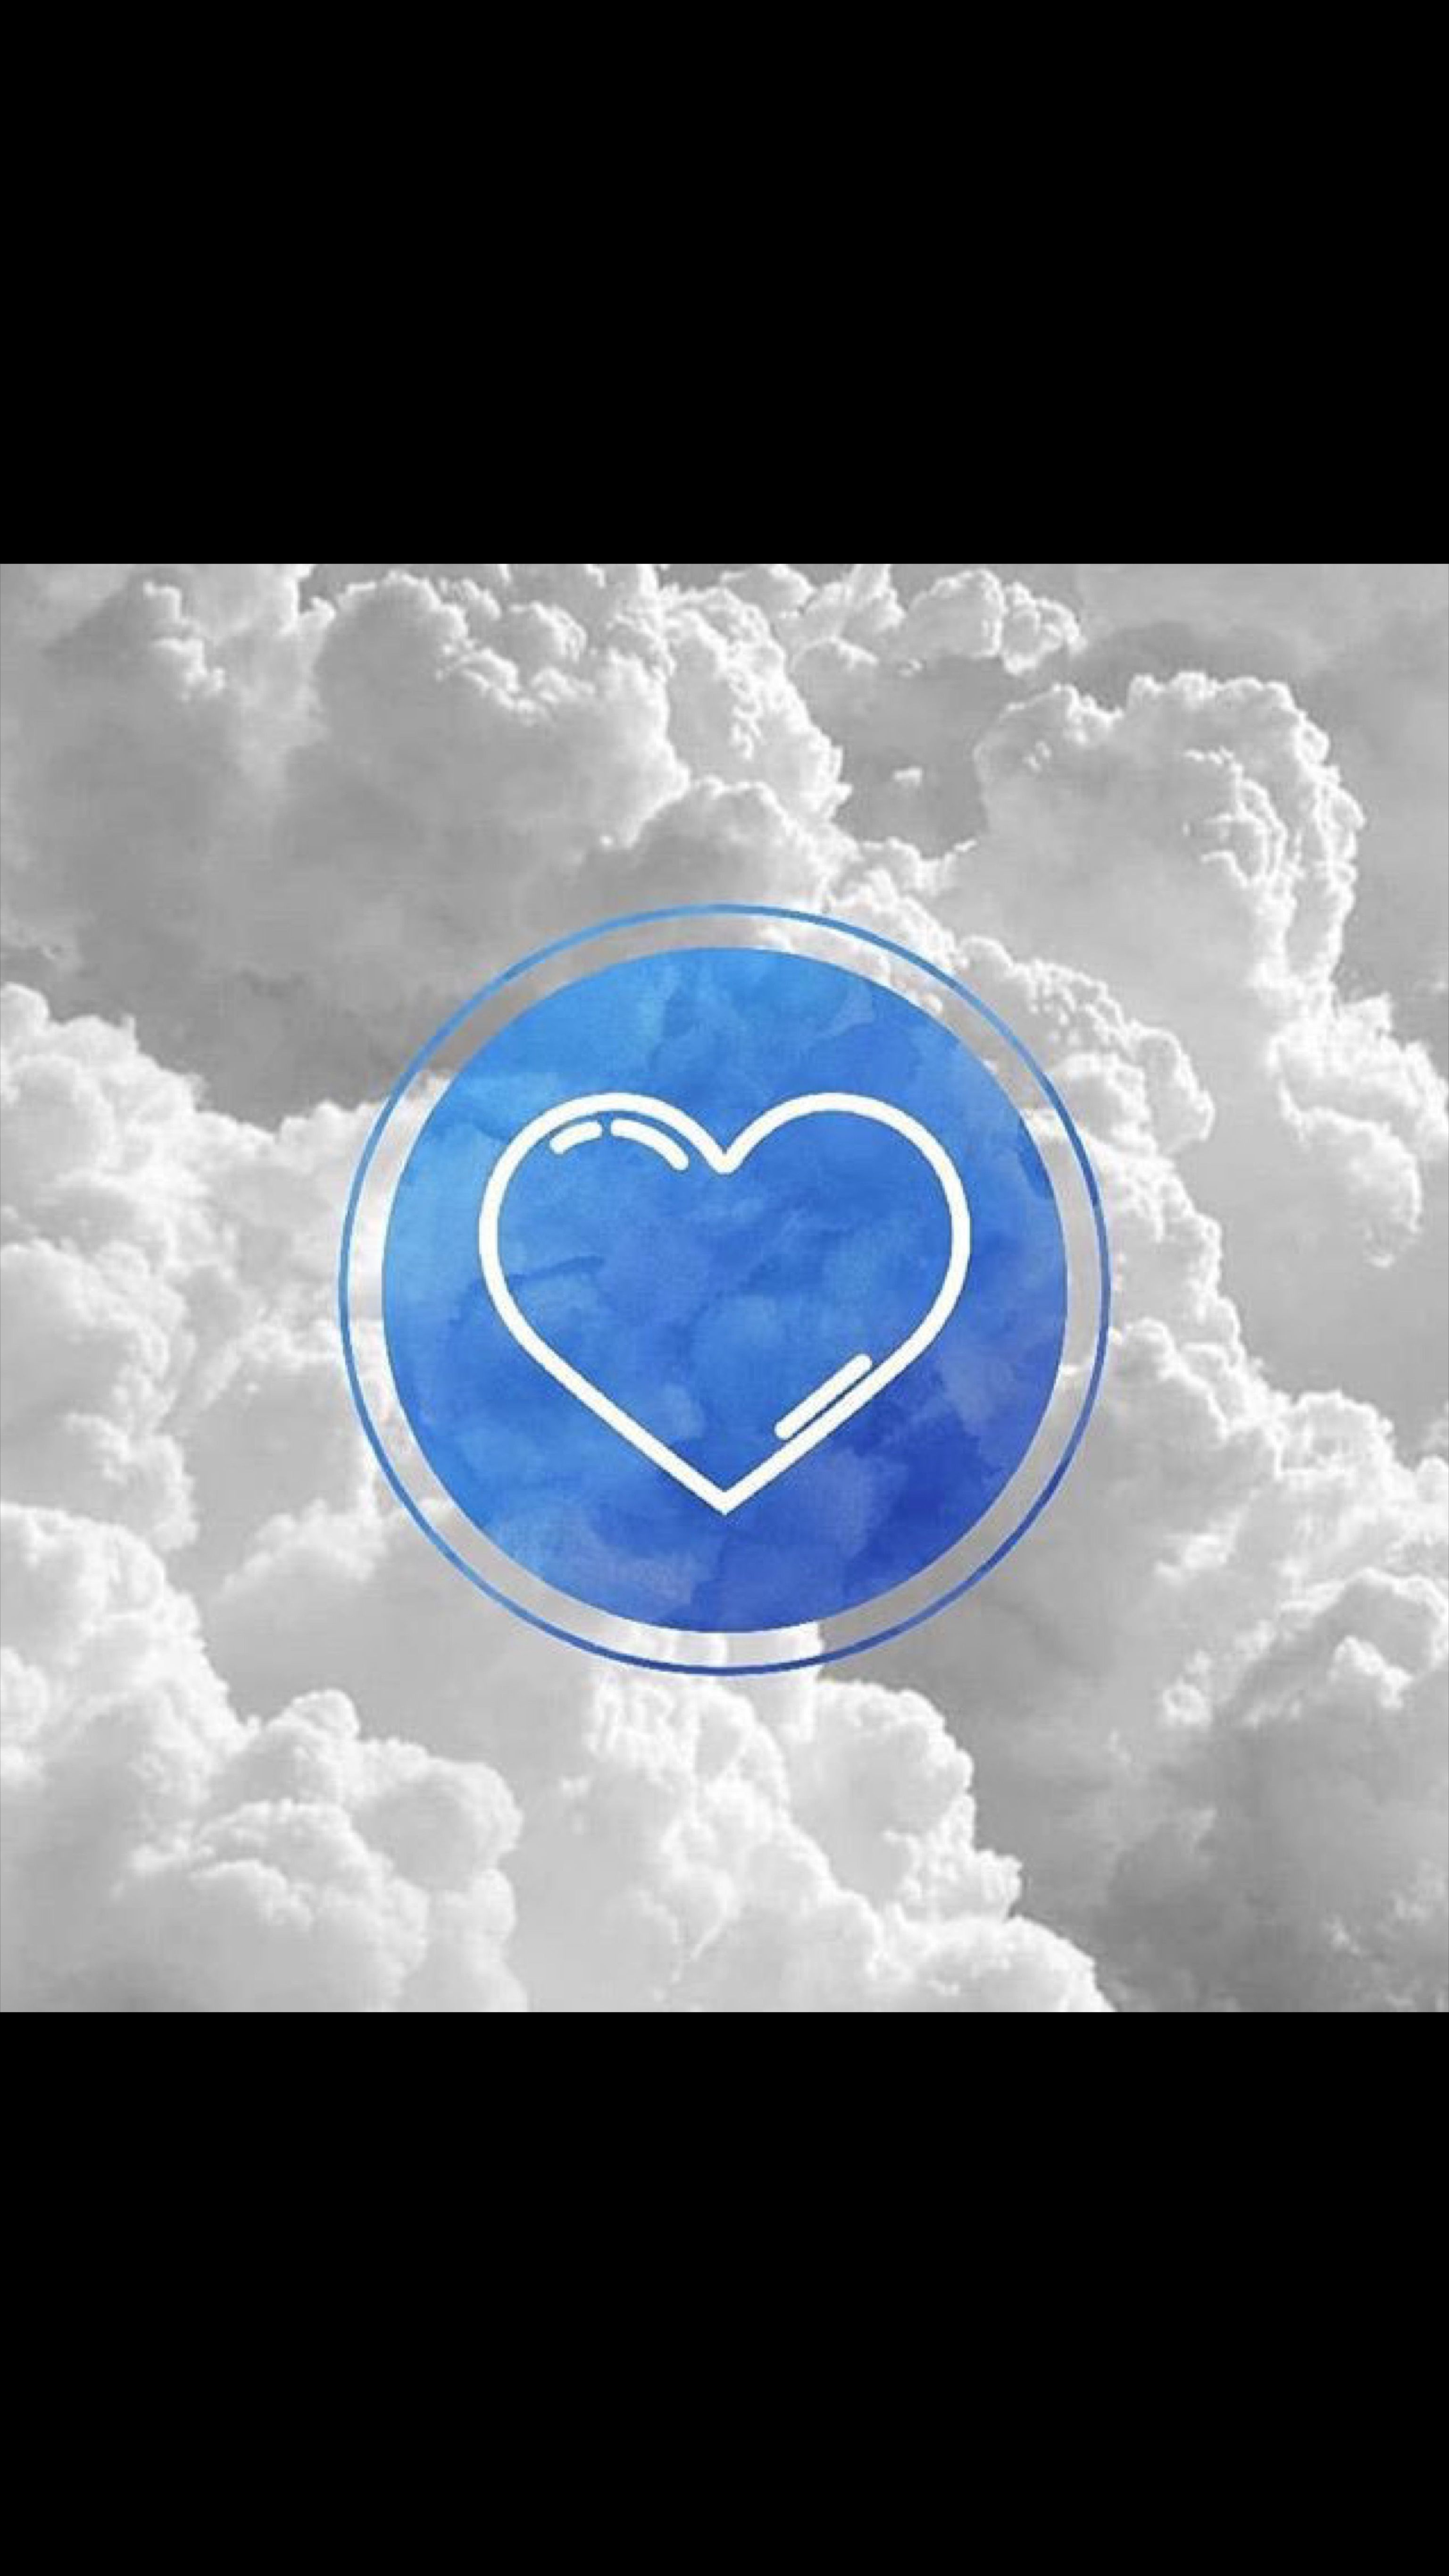 Pin By ميـم On هايلايت انستقرام Photo Editing Apps Heart Wallpaper Photo